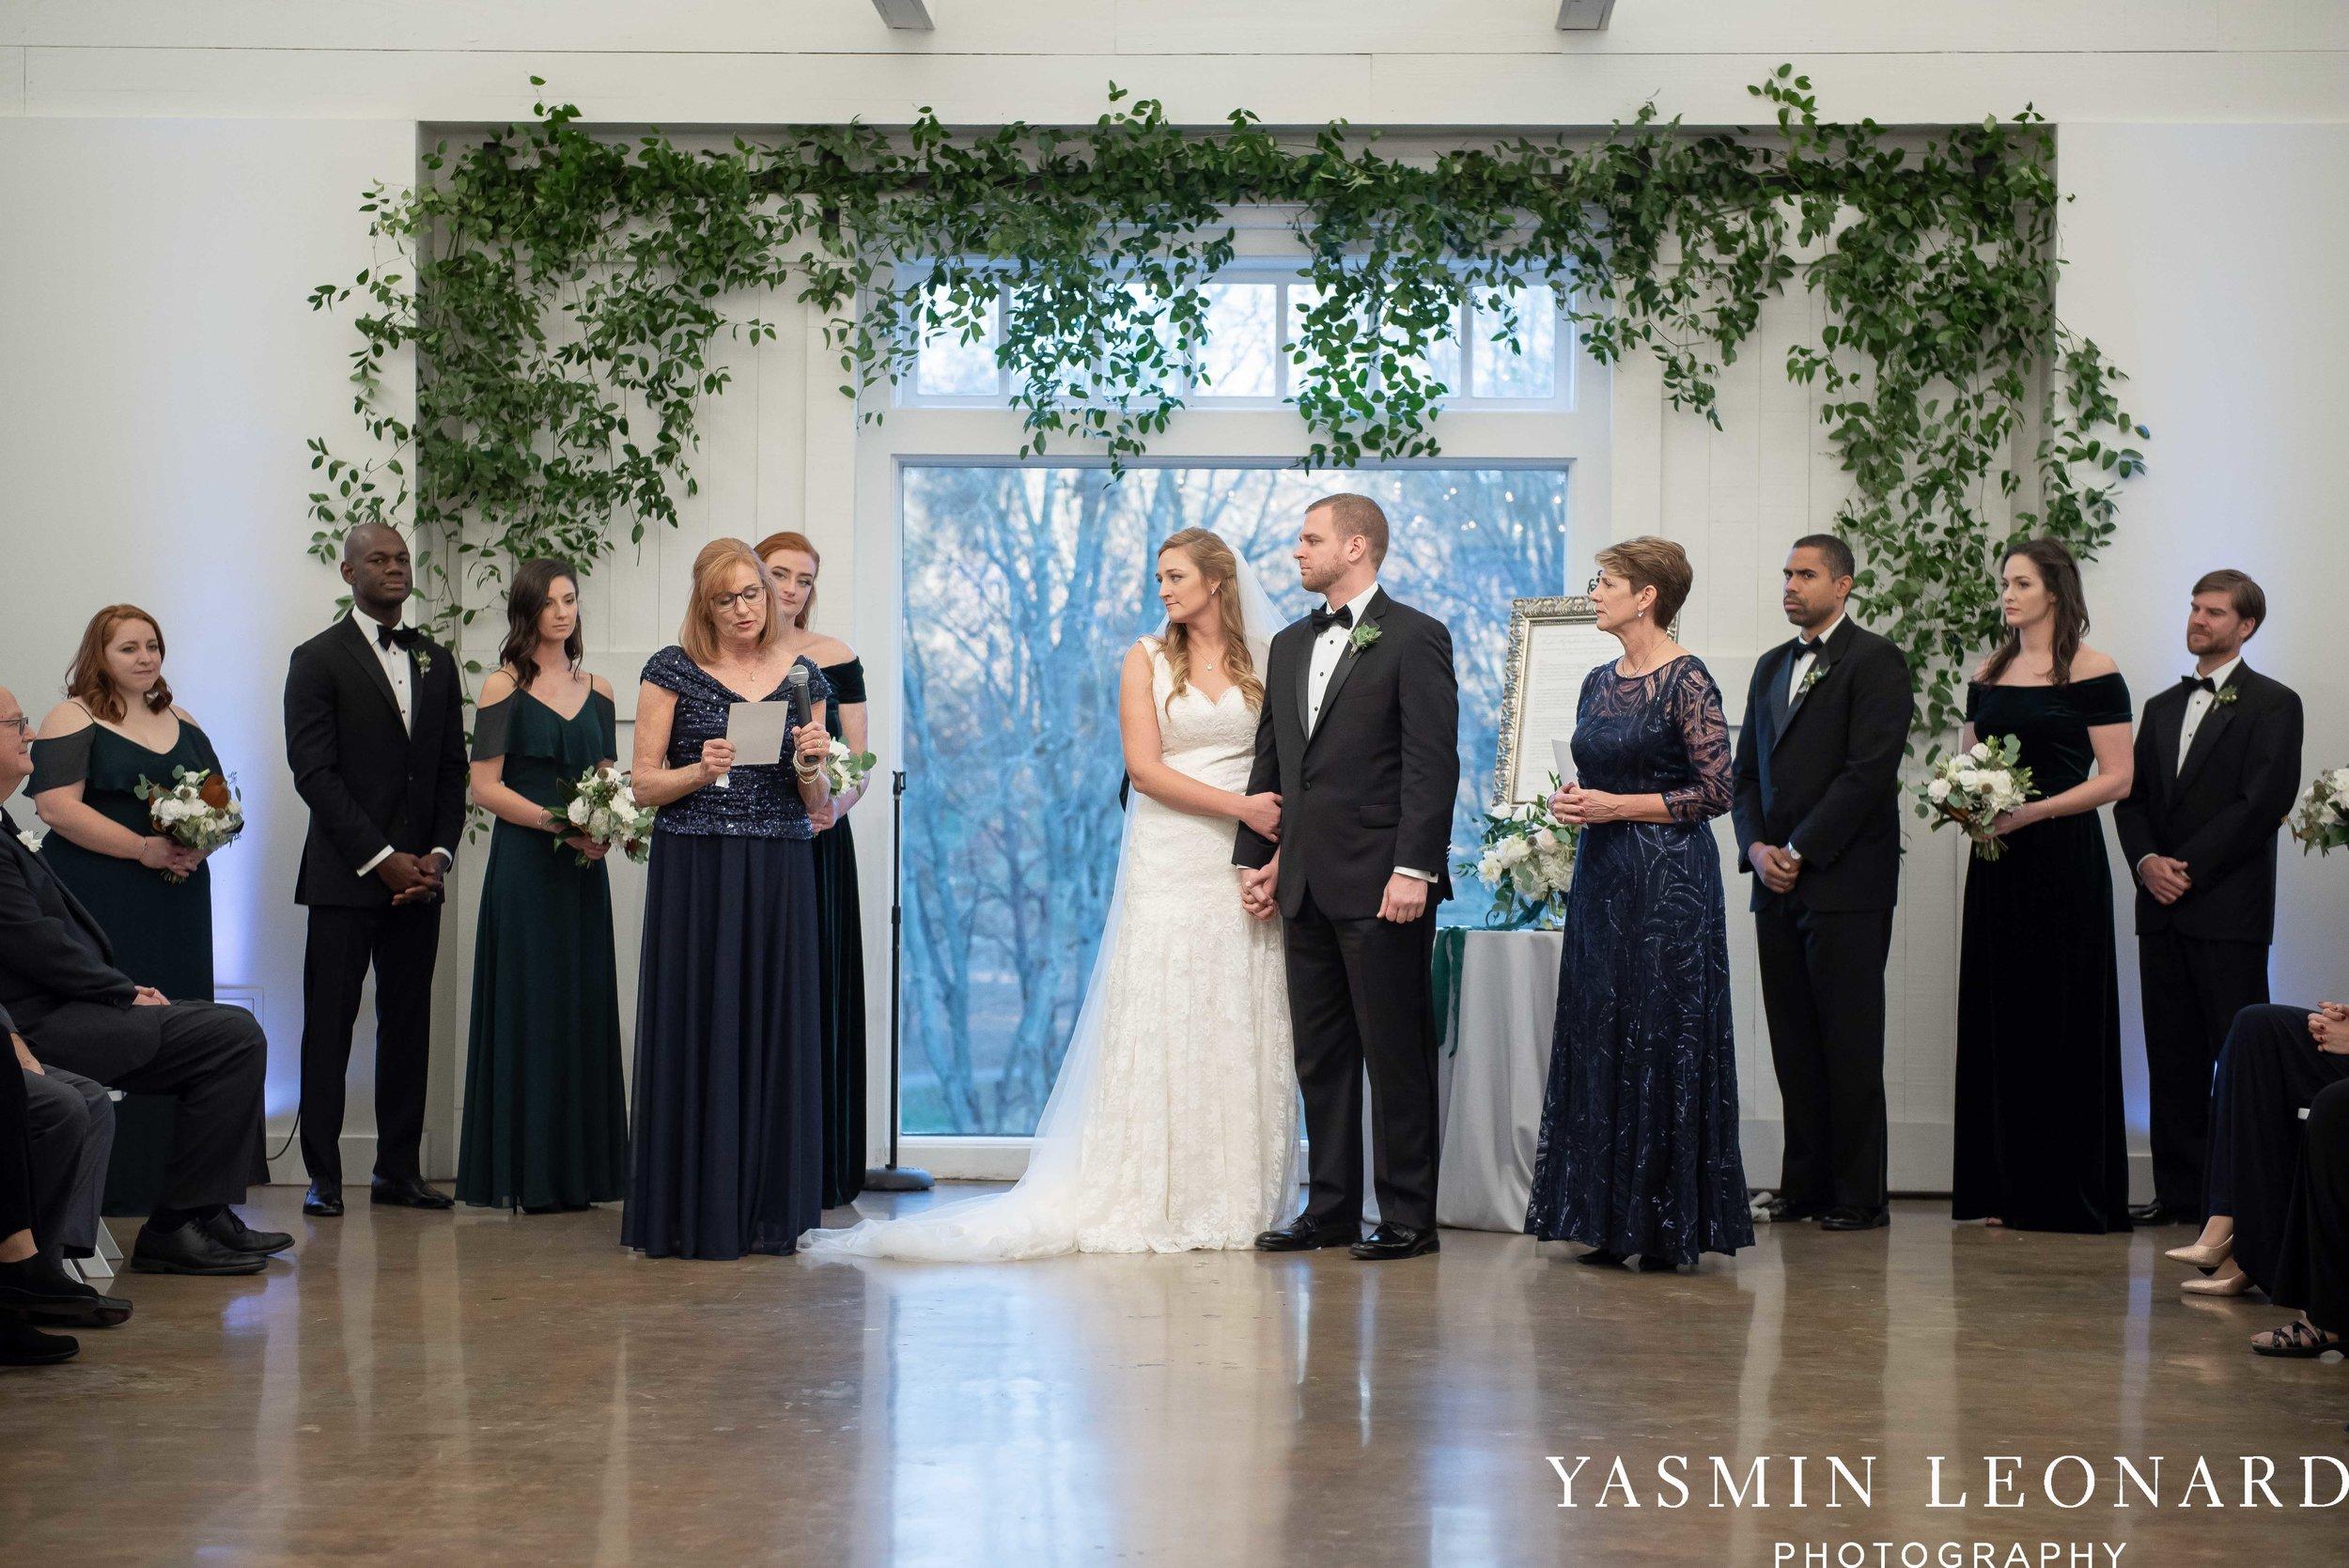 Barn at Reynolda Village - Winston Salem Wedding - White and Green Wedding - NC Wedding - NC Barns - Yasmin Leonard Photography-60.jpg